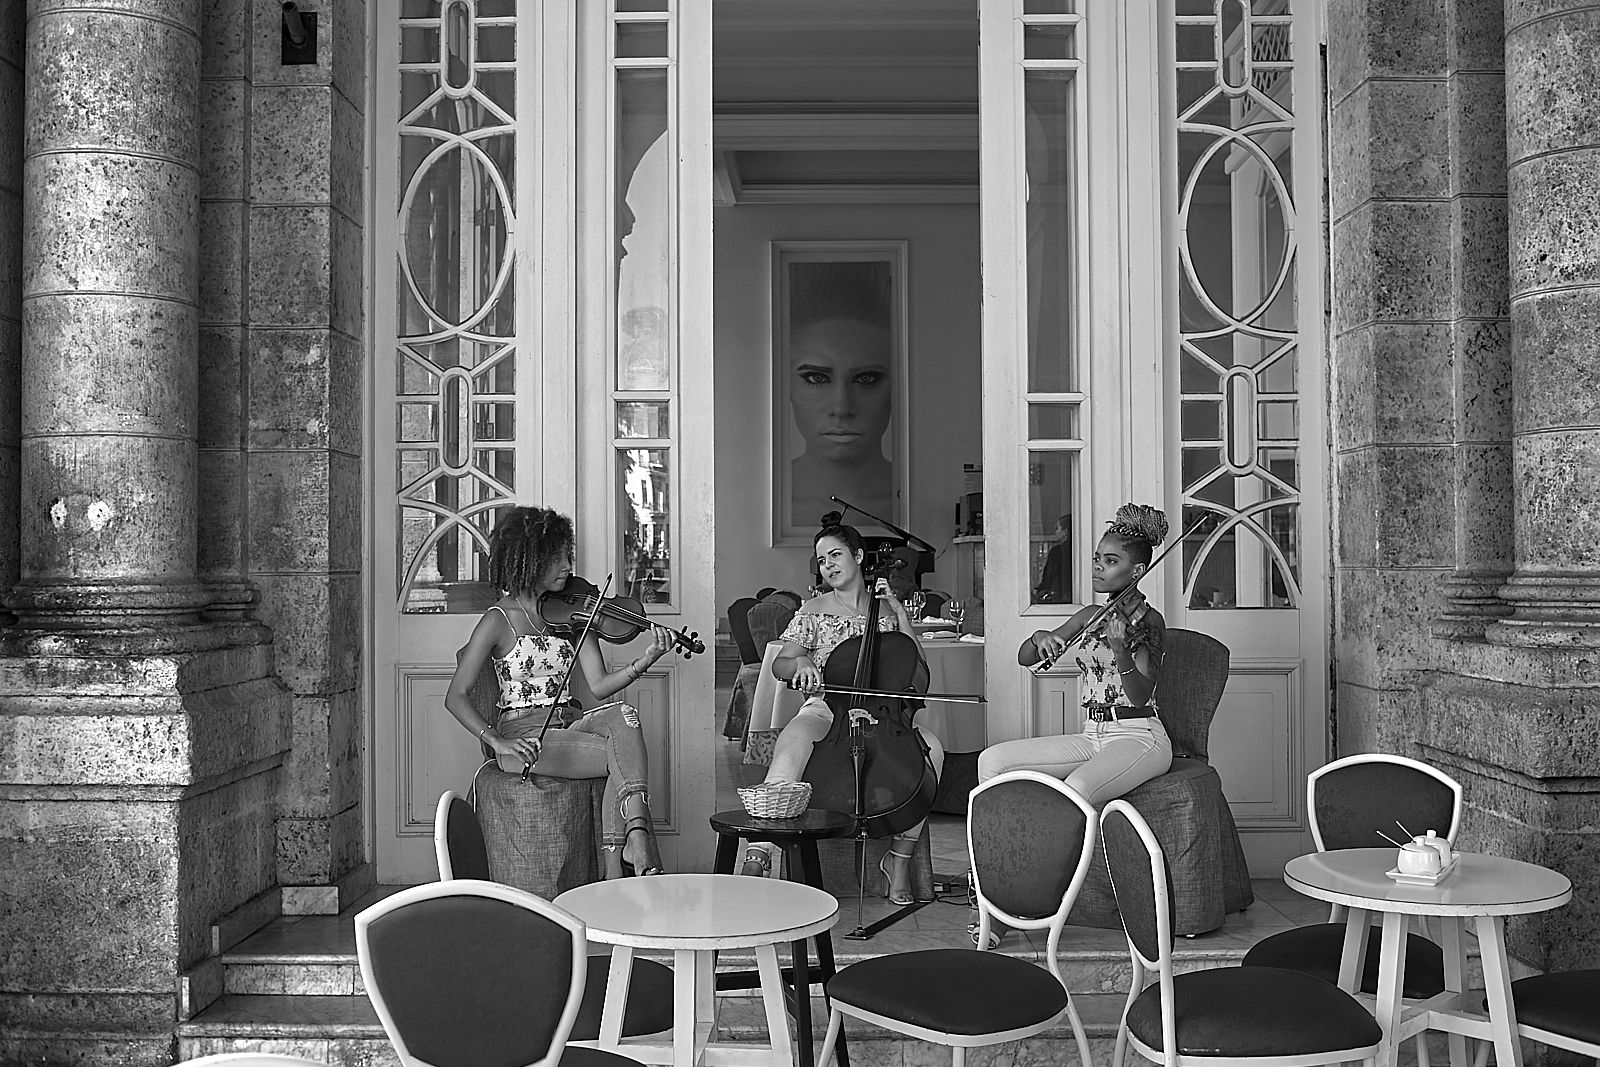 Habana Ensamble de cuerdas